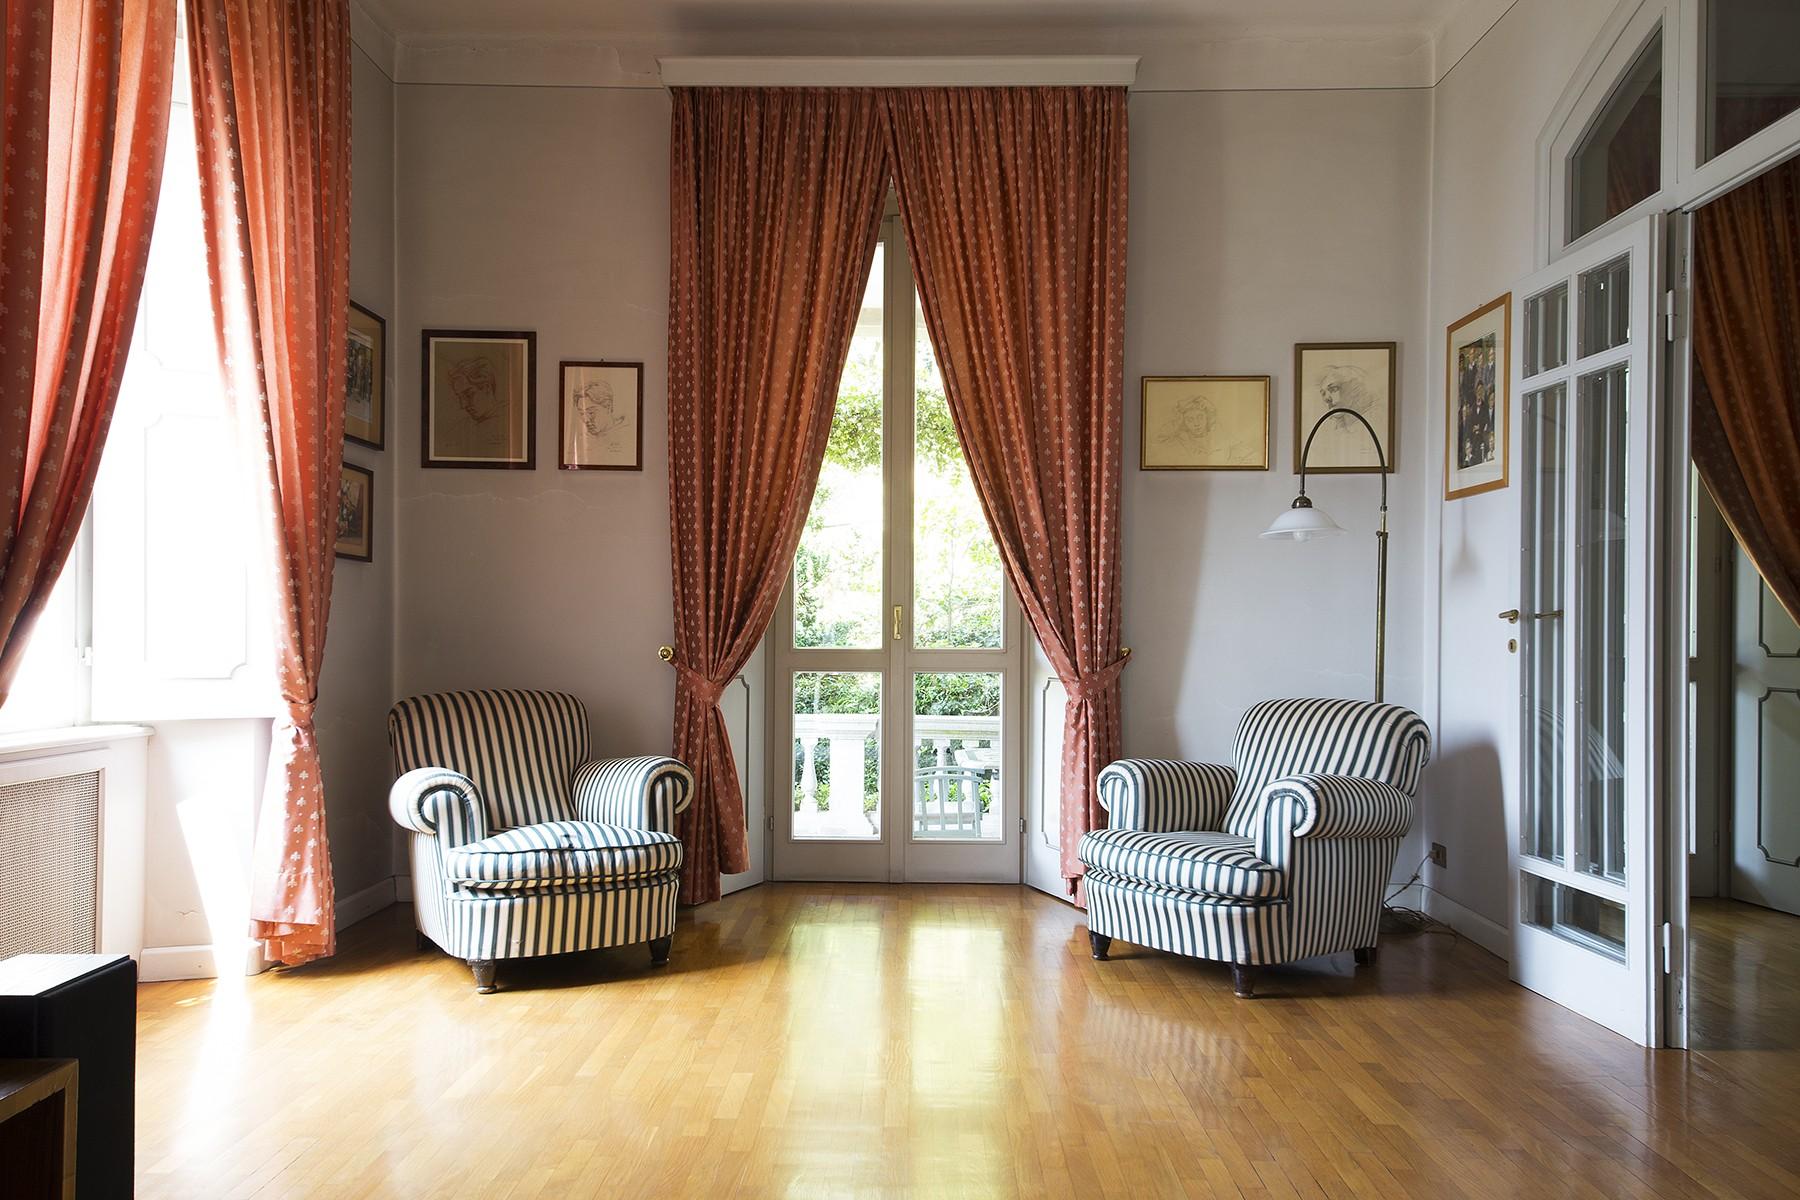 Additional photo for property listing at Historic villa in the best panoramic area of the city of Como Via Torno Como, Como 22100 Italia